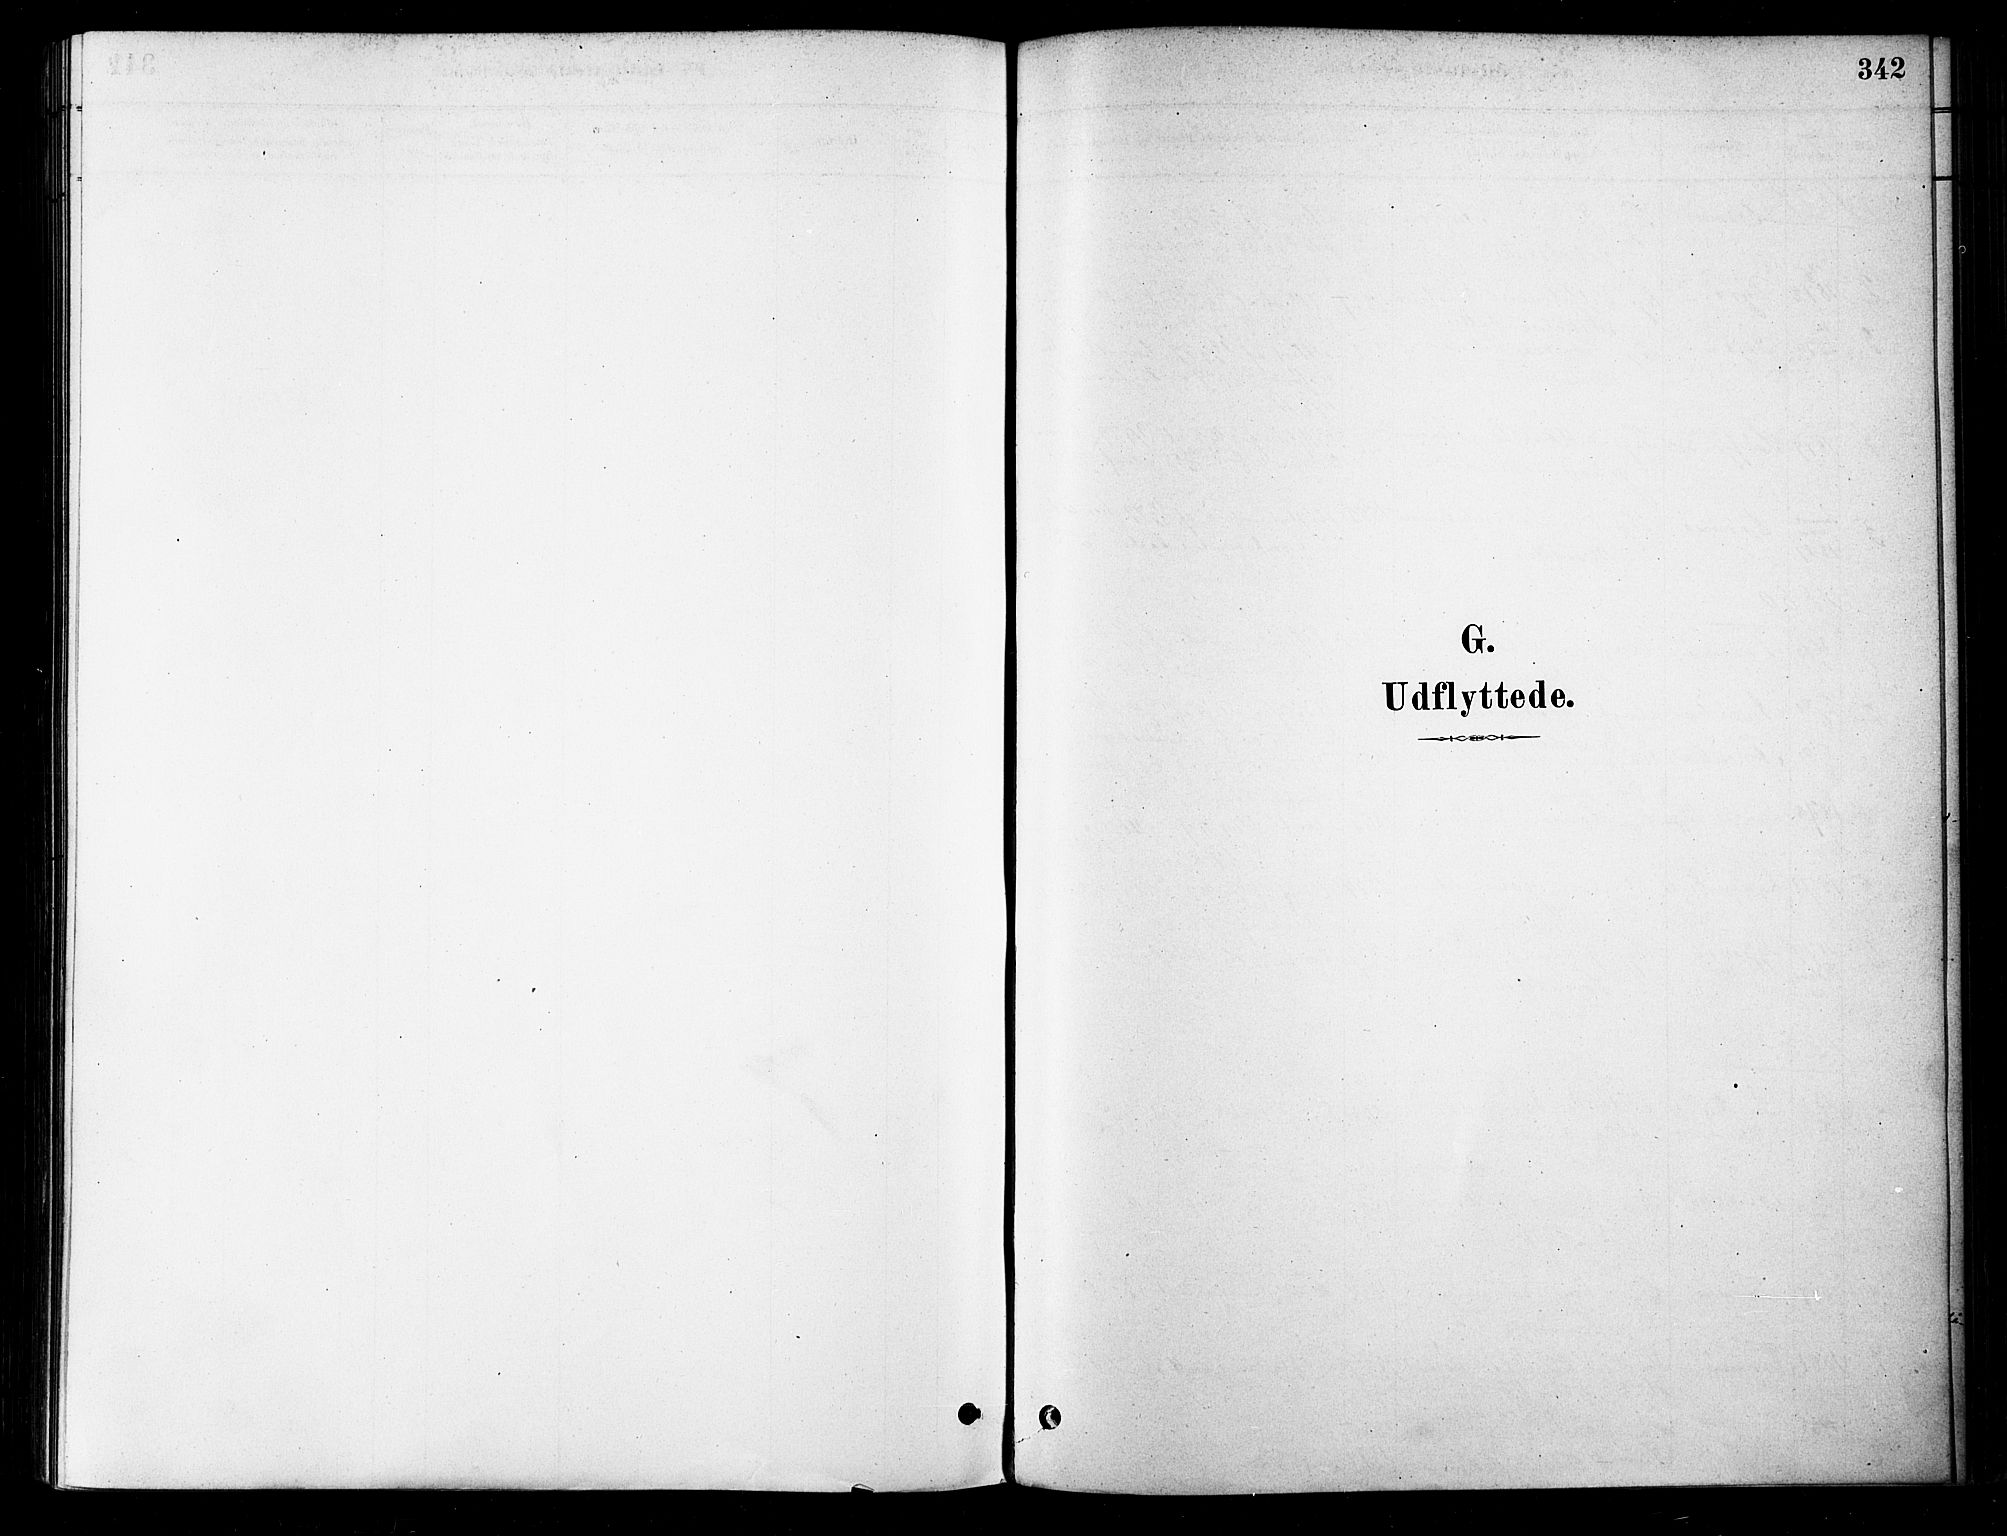 SATØ, Karlsøy sokneprestembete, H/Ha/Haa/L0006kirke: Parish register (official) no. 6, 1879-1890, p. 342